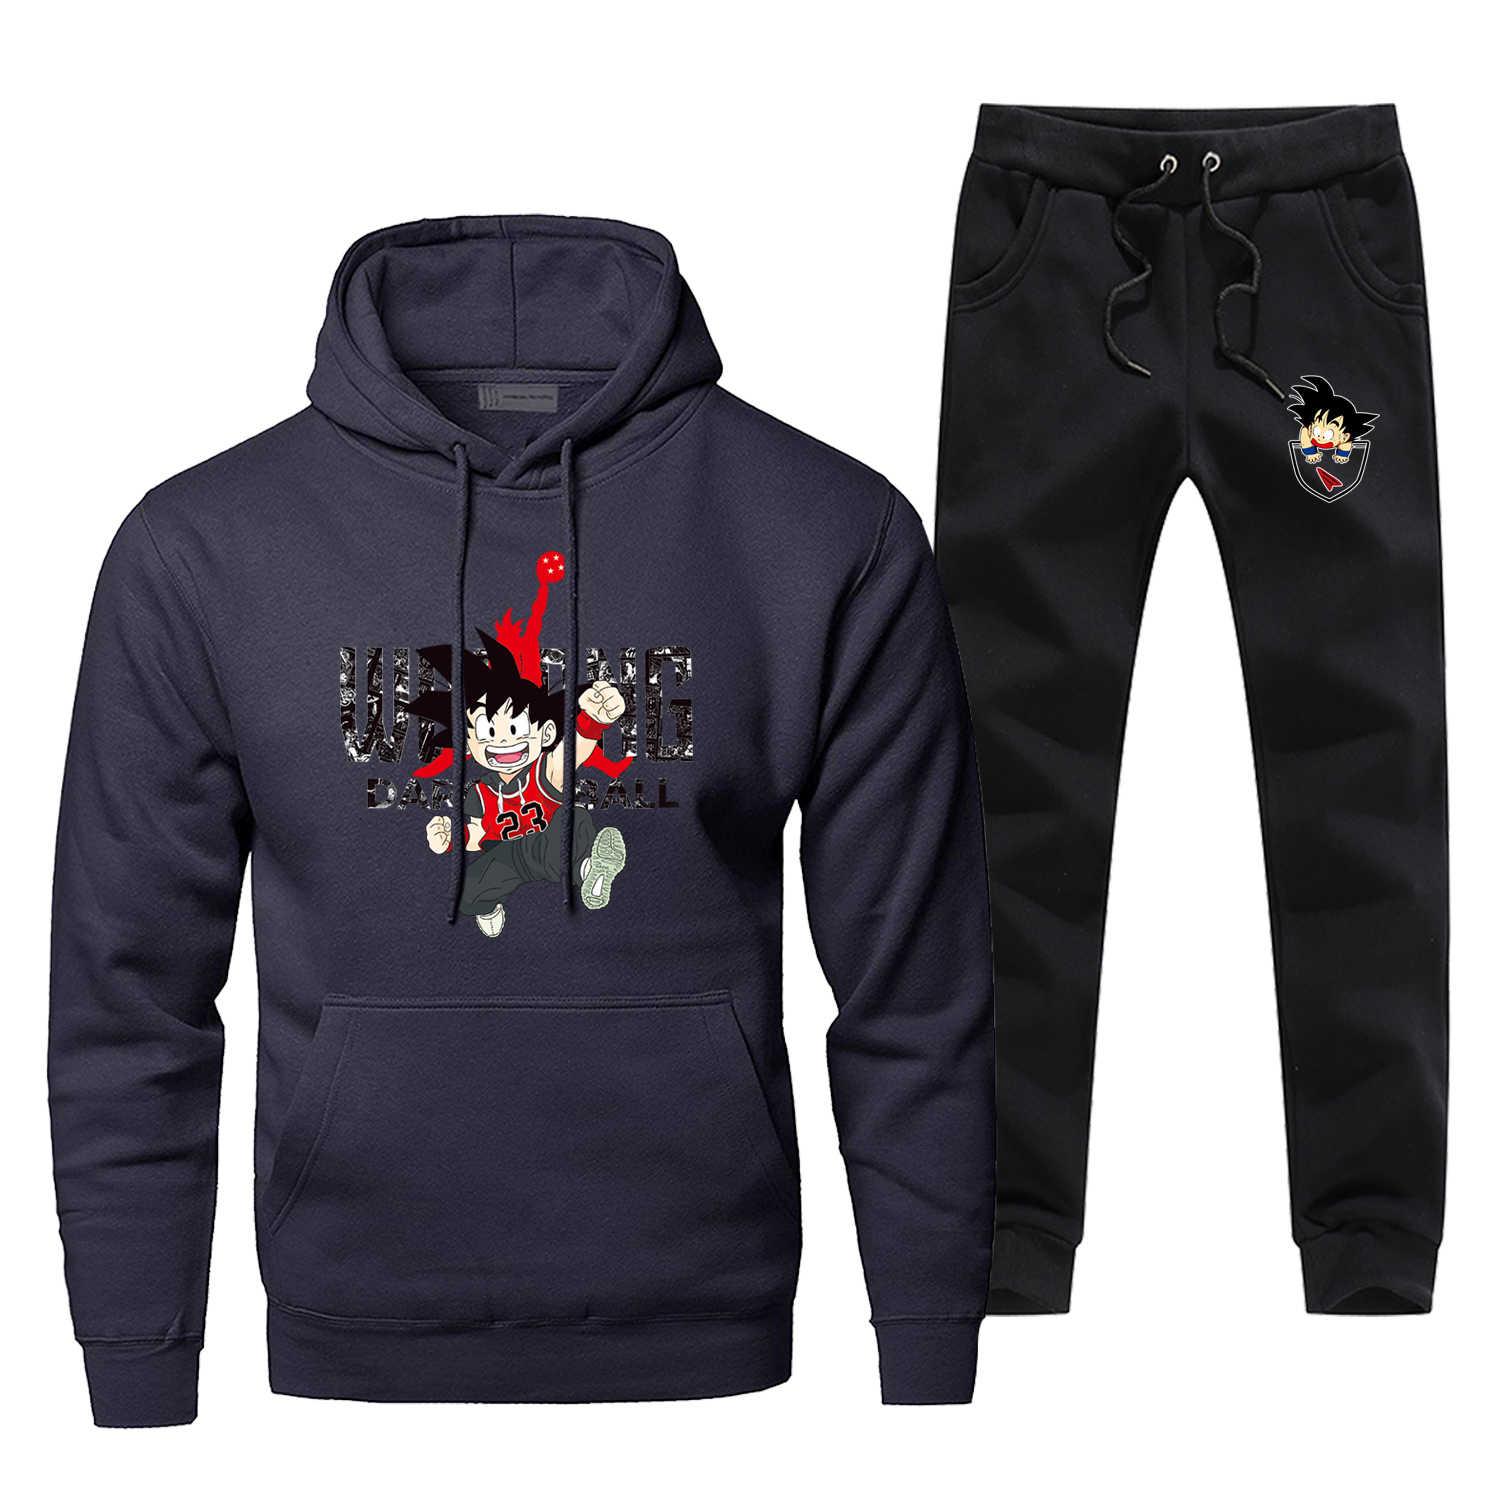 Grappig Japan Anime Dragon Ball Jordan 23 Print Trainingspak Hoodie + broek Mannen Tweedelige Sets Winter Warm Fleece Sportkleding sweatshirt